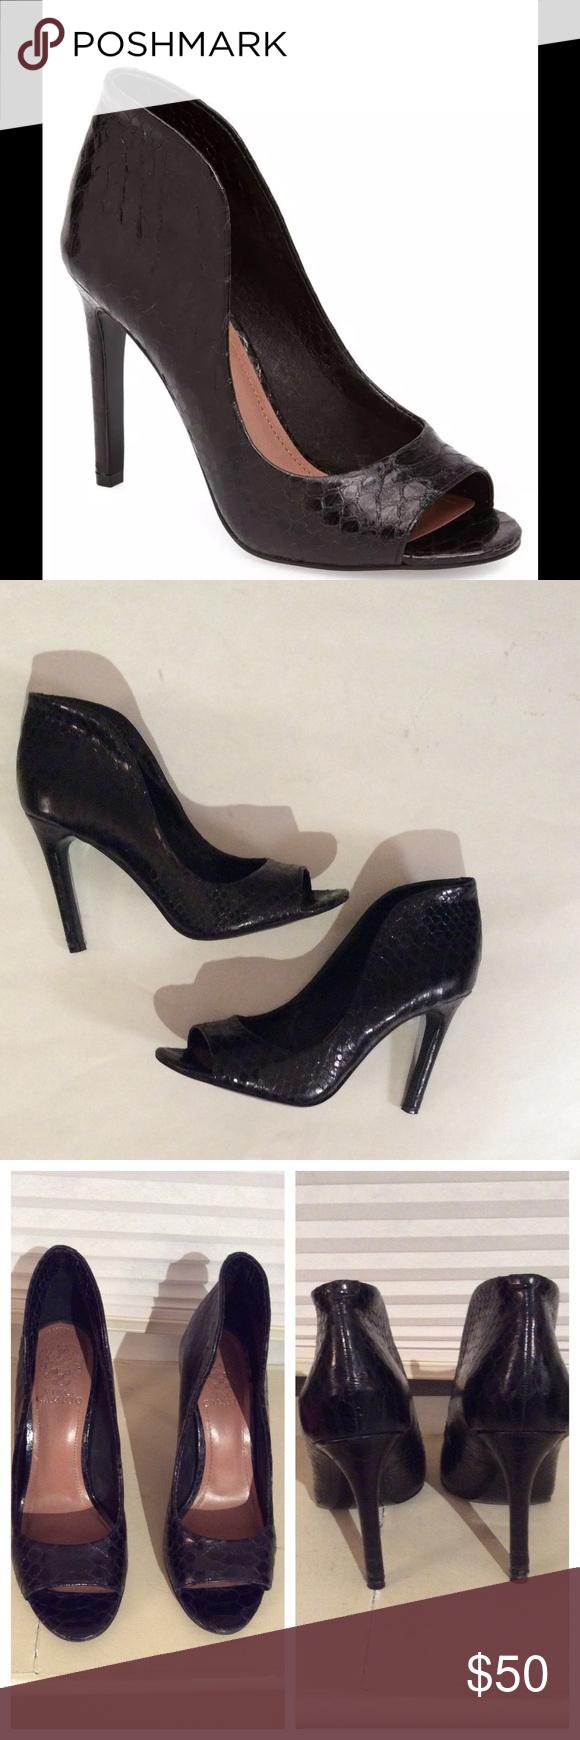 Pre-owned - Leather heels Vince Camuto 1KkOCv9j